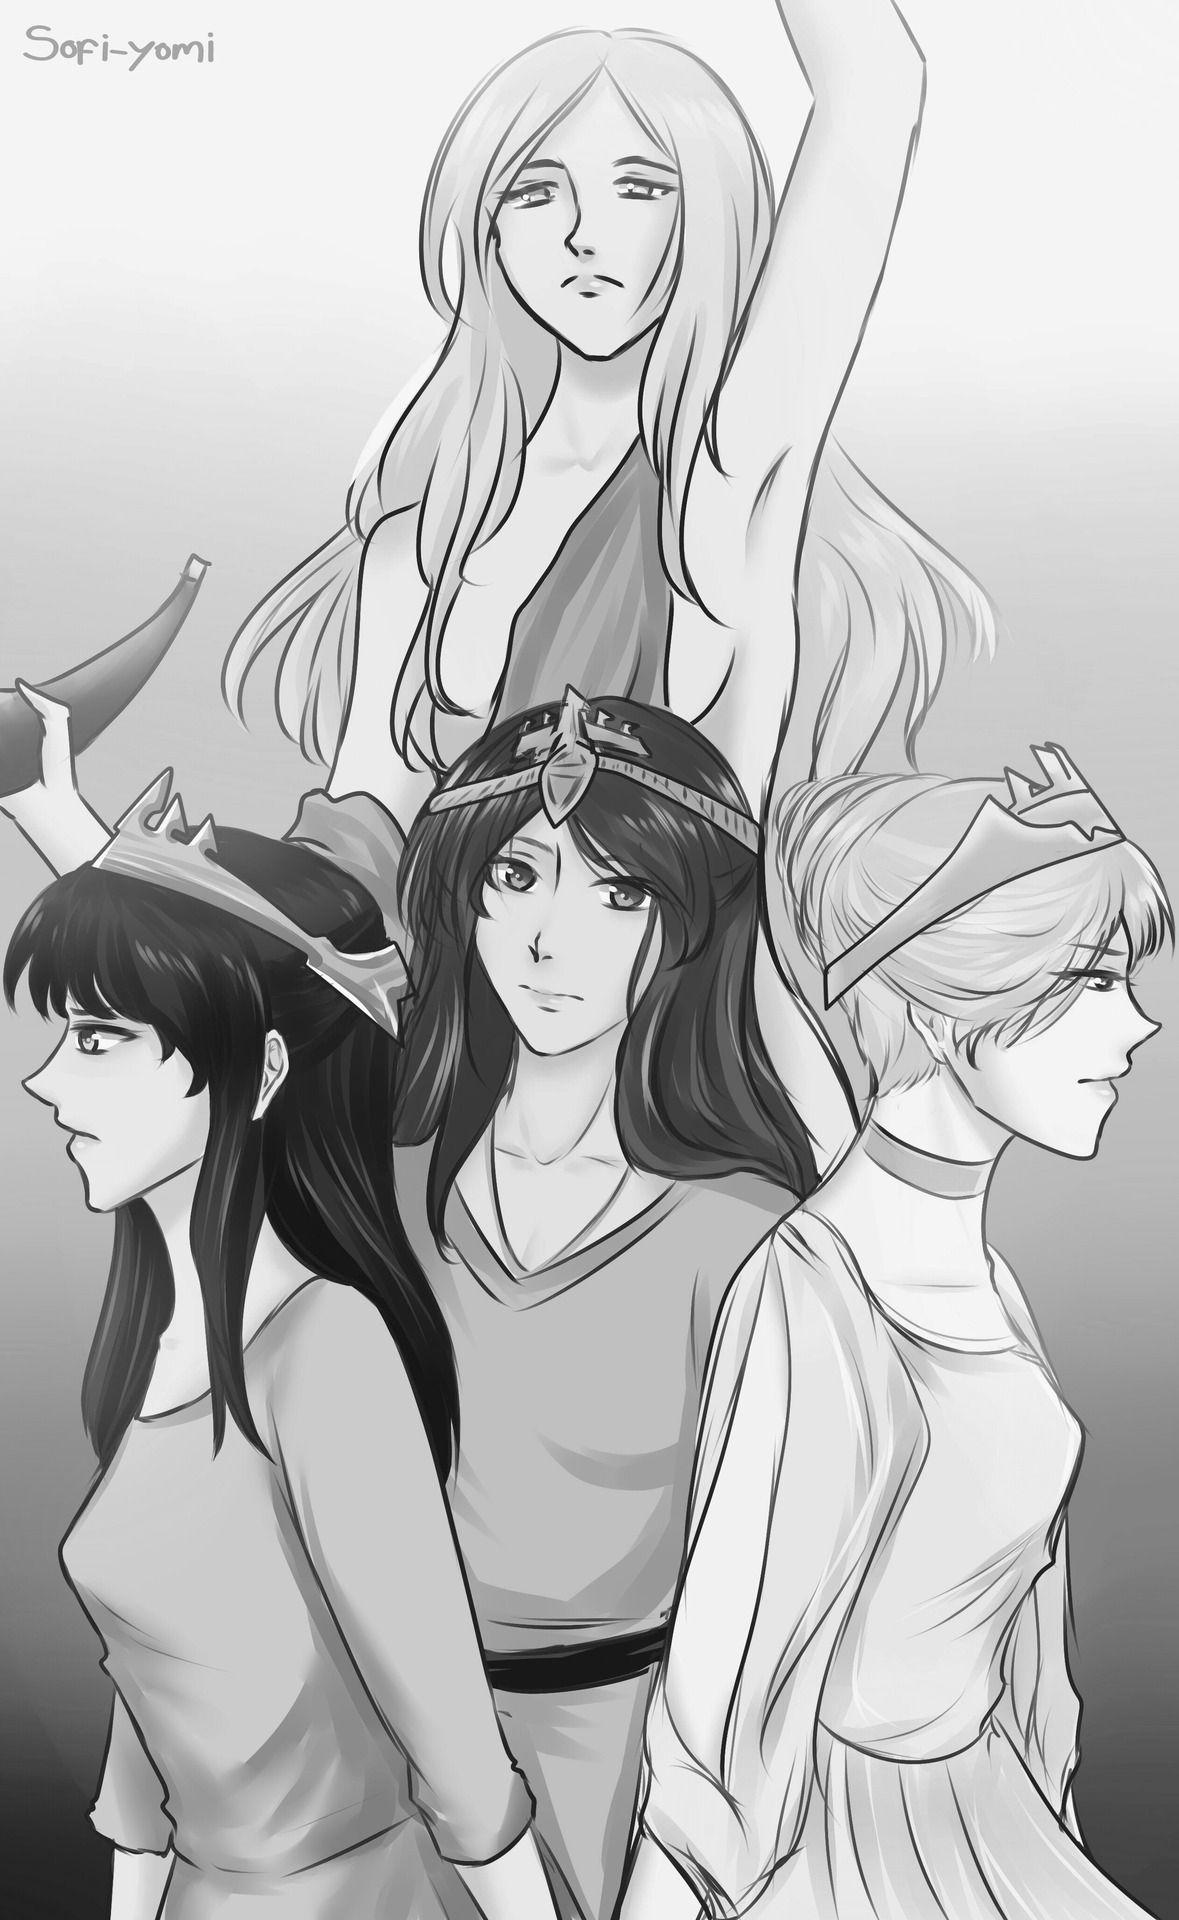 Sofi Yomi Ymir And Her Three Daughters Attack On Titan Levi Attack On Titan Titans